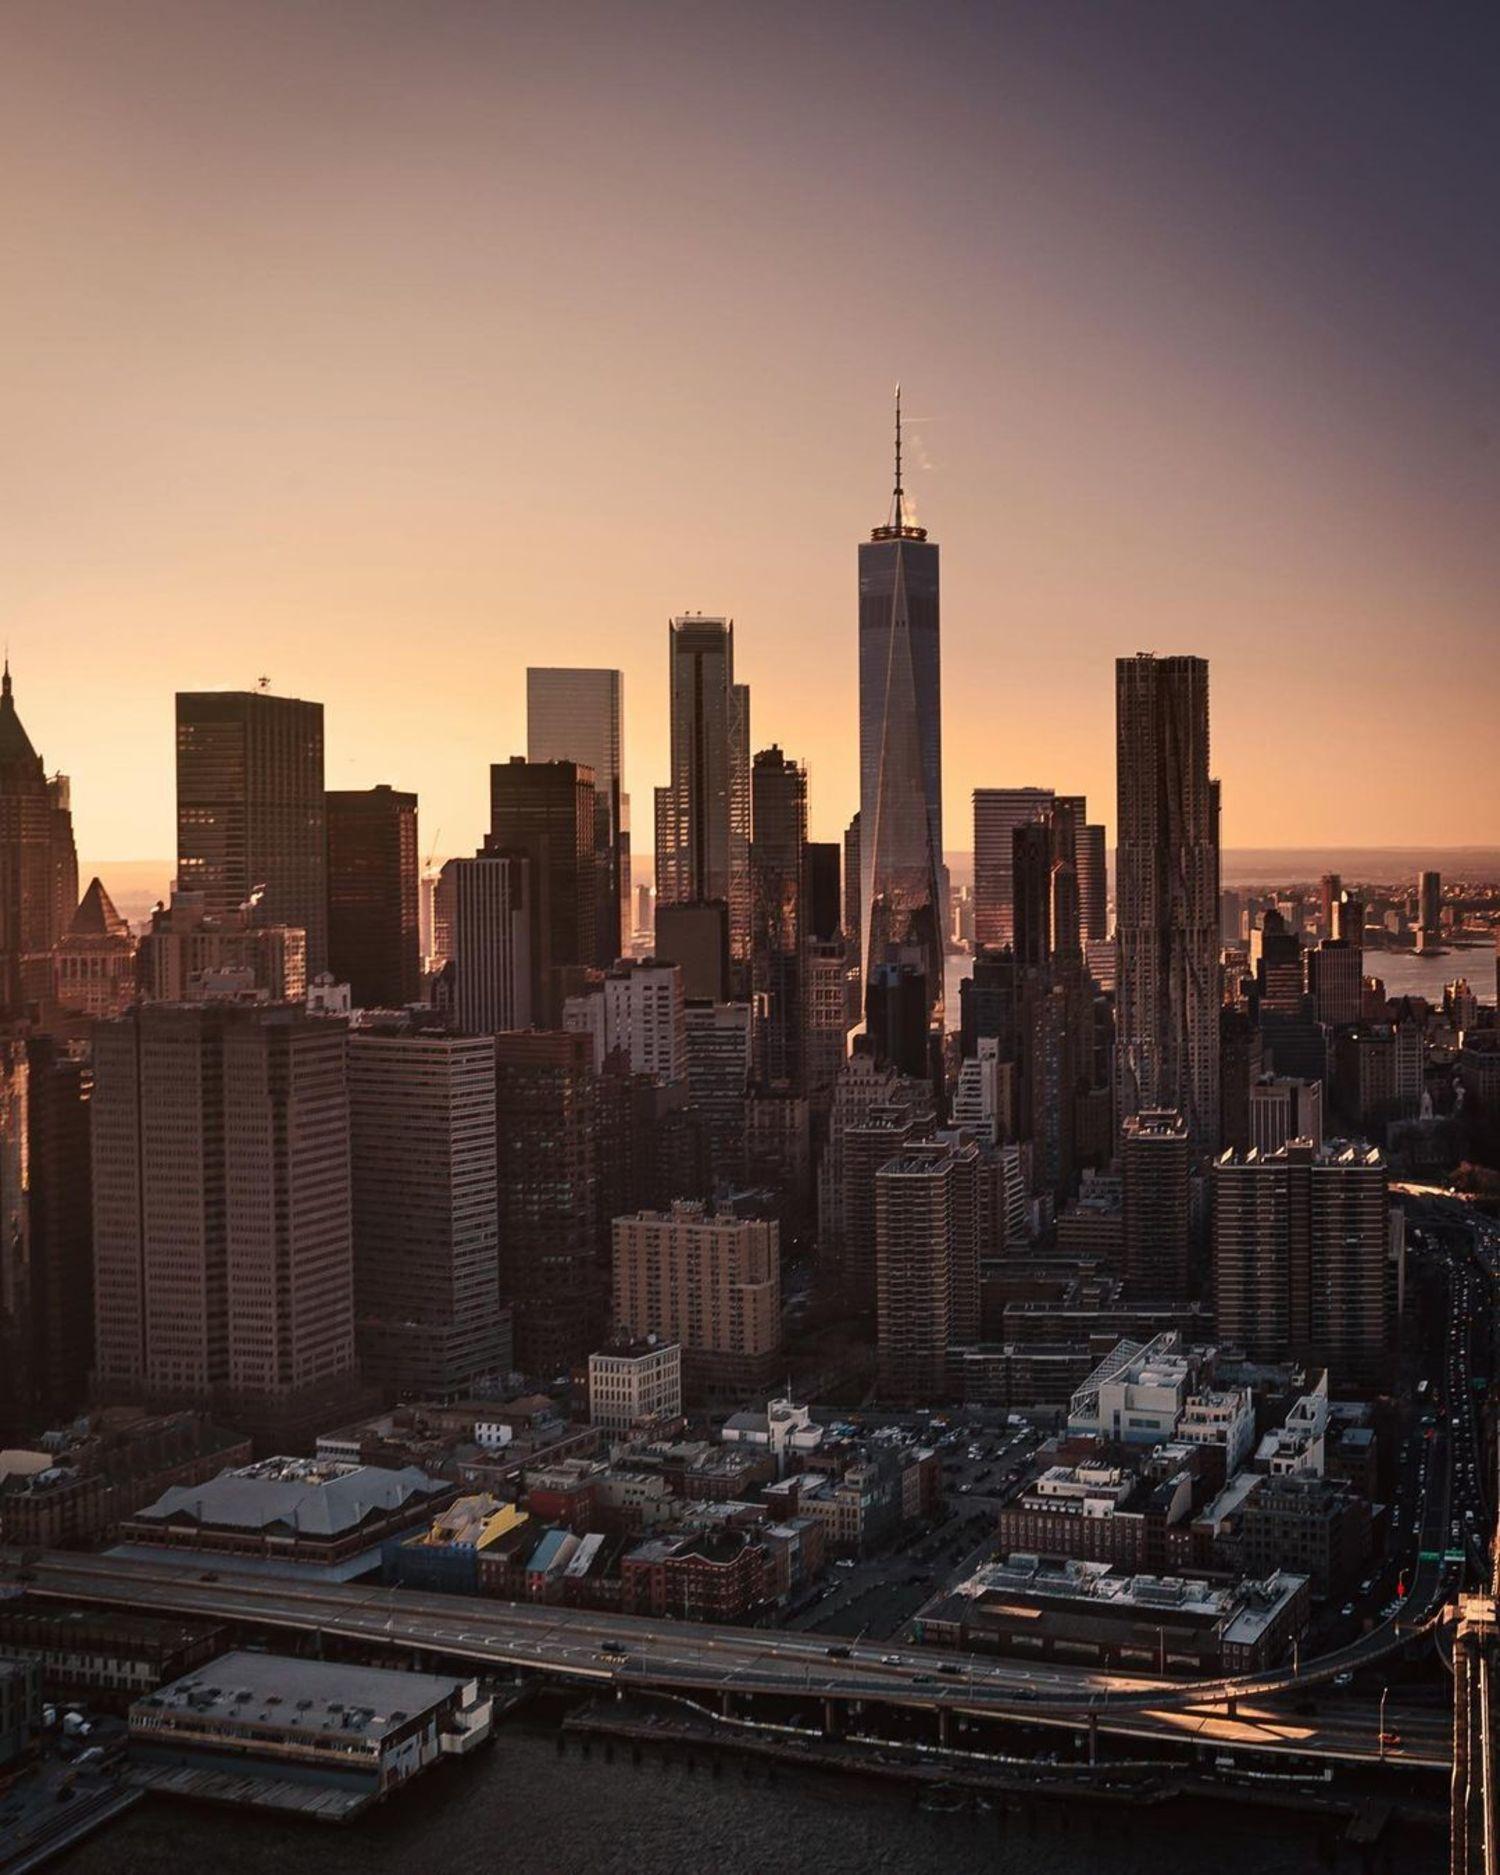 Sunset over Lower Manhattan